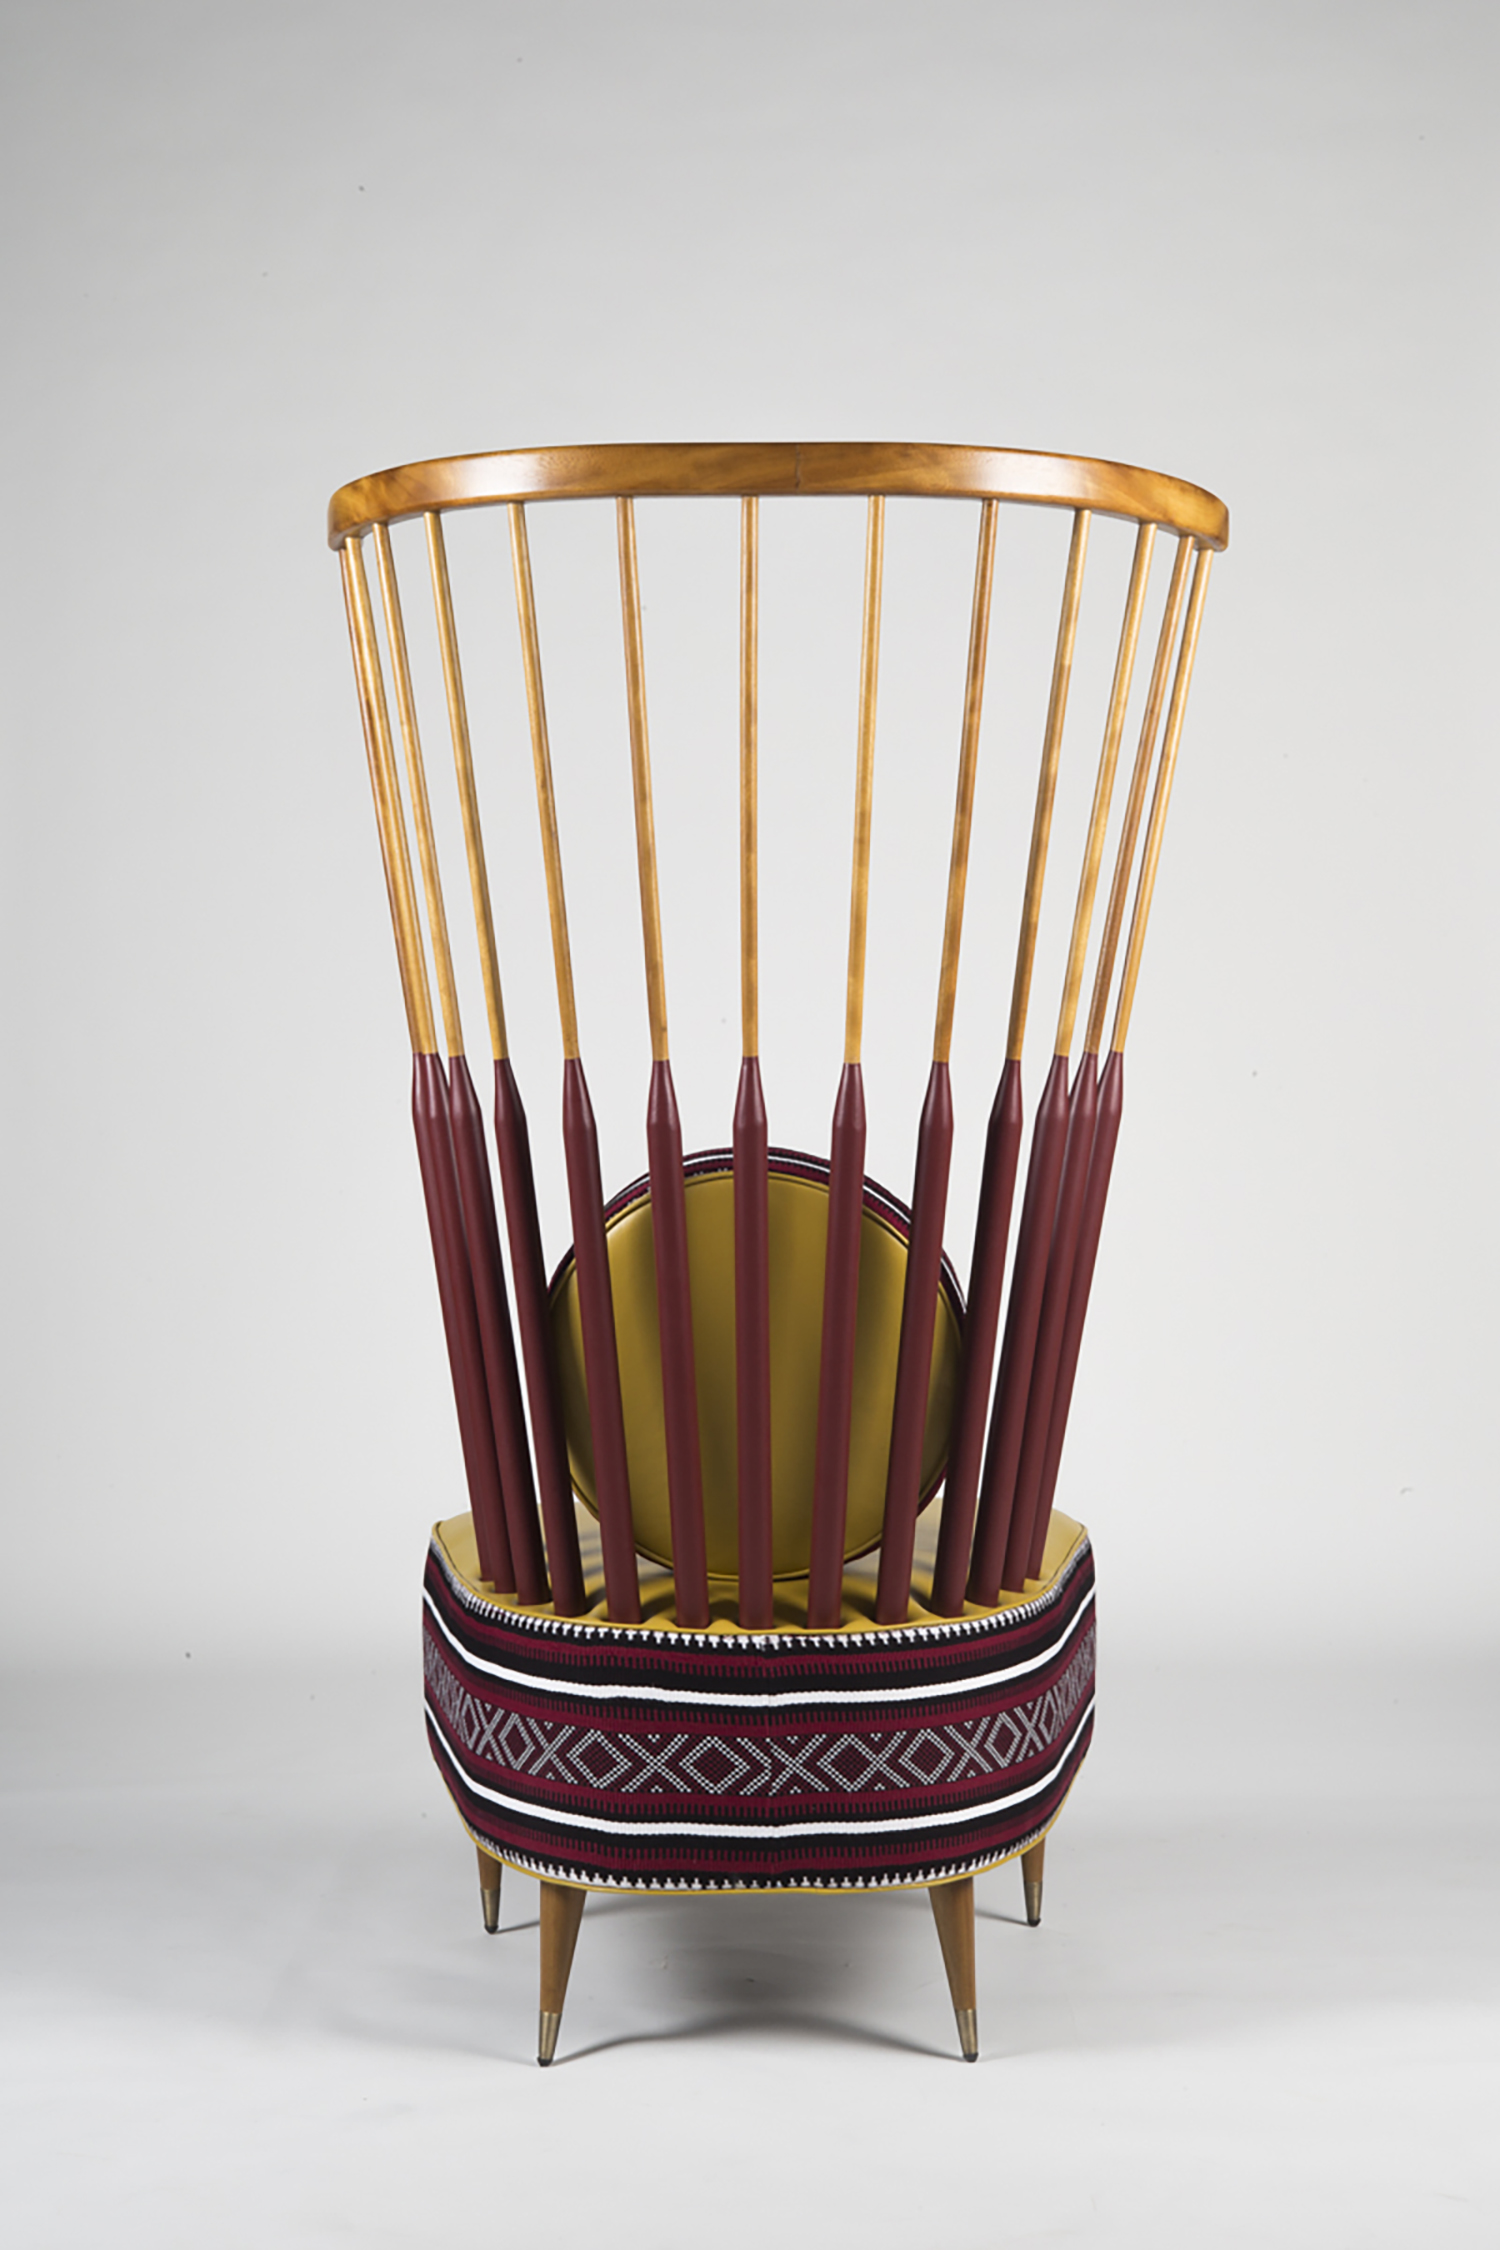 Studio MUJU -Moza Chair 5.jpg